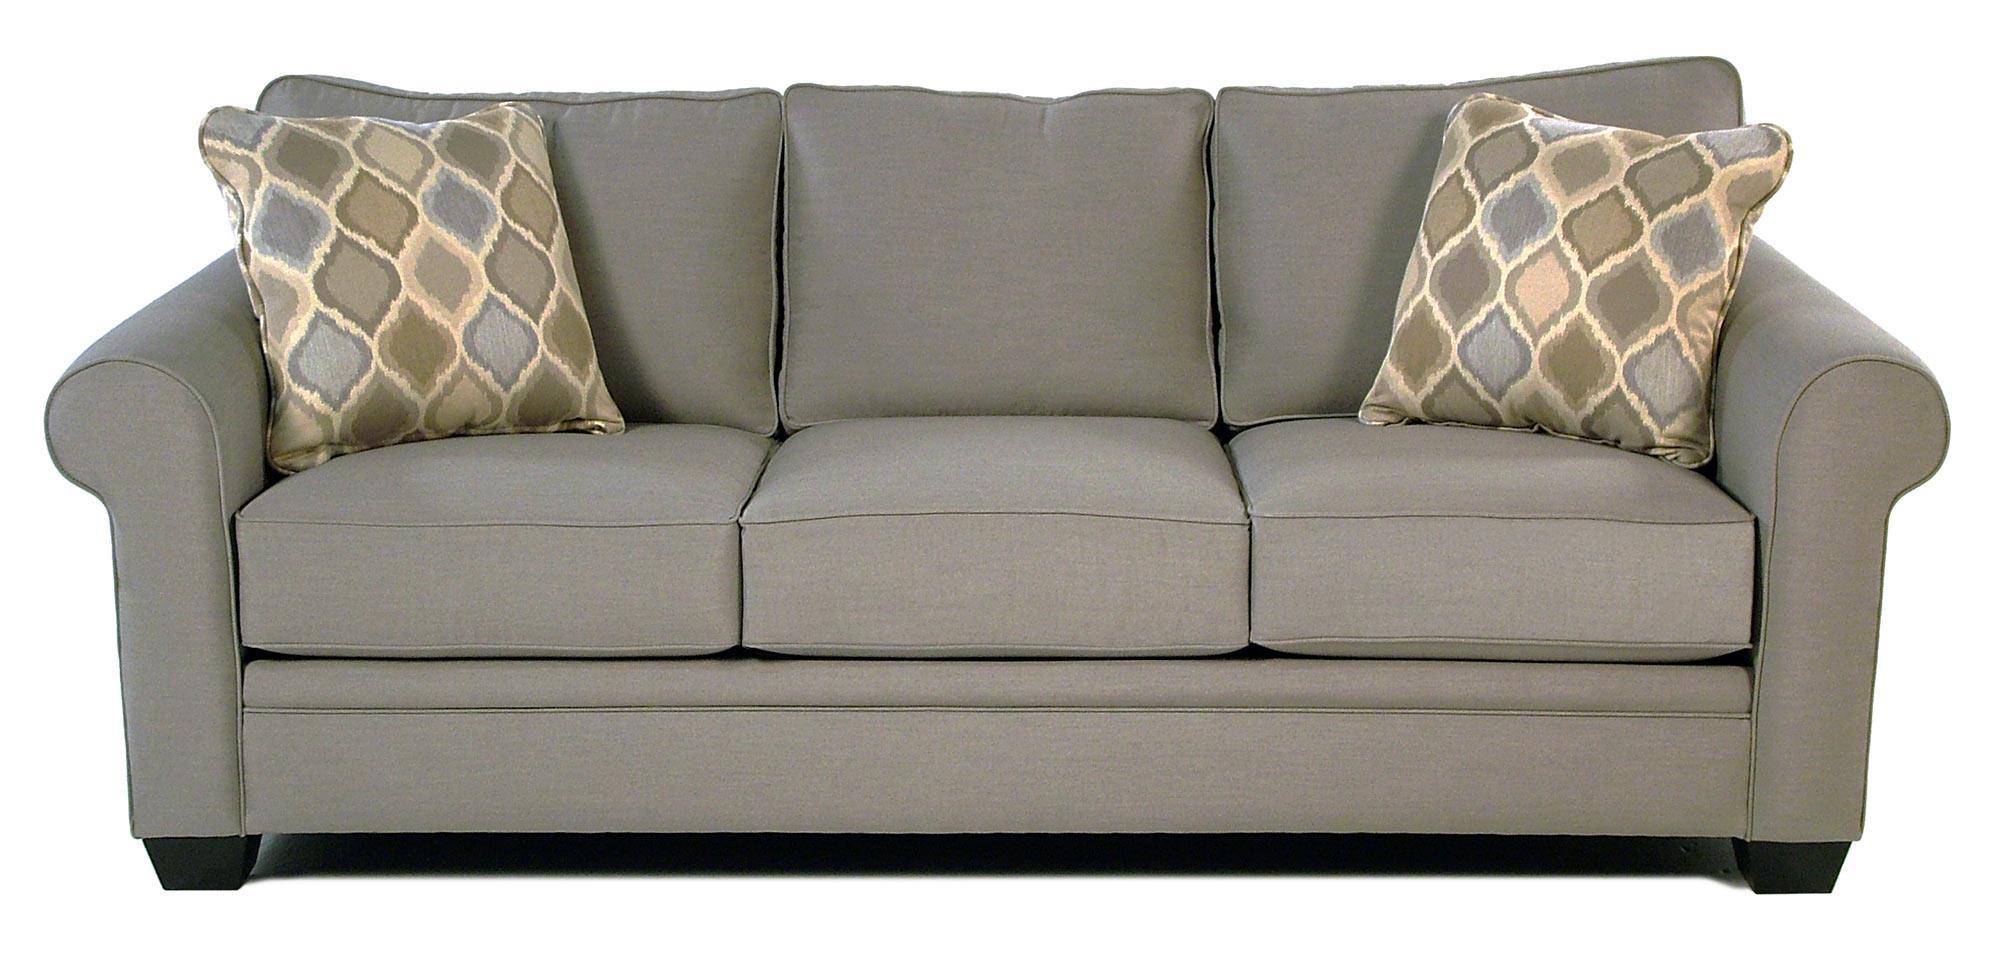 jonathan louis mackenzie roll arm sofa w sunbrella fabric - Sunbrella Fabric